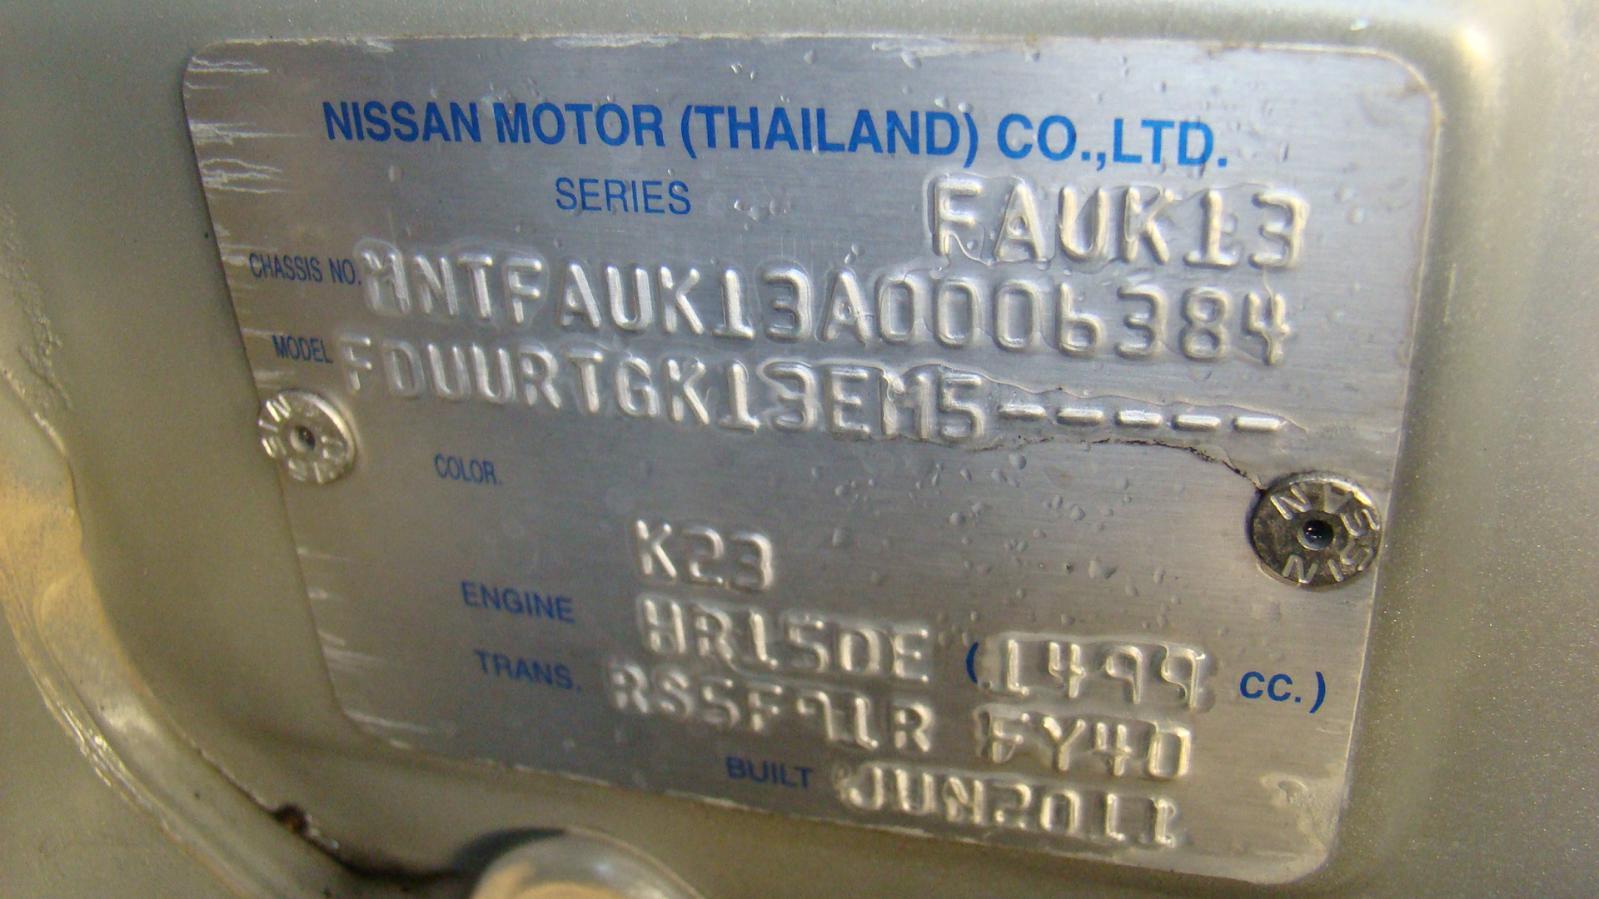 Nissan Micra Engine Fuse Box Explained Wiring Diagrams B12 In Bay 1 5ltr Petrol K13 11 10 16 Ebay Sentra